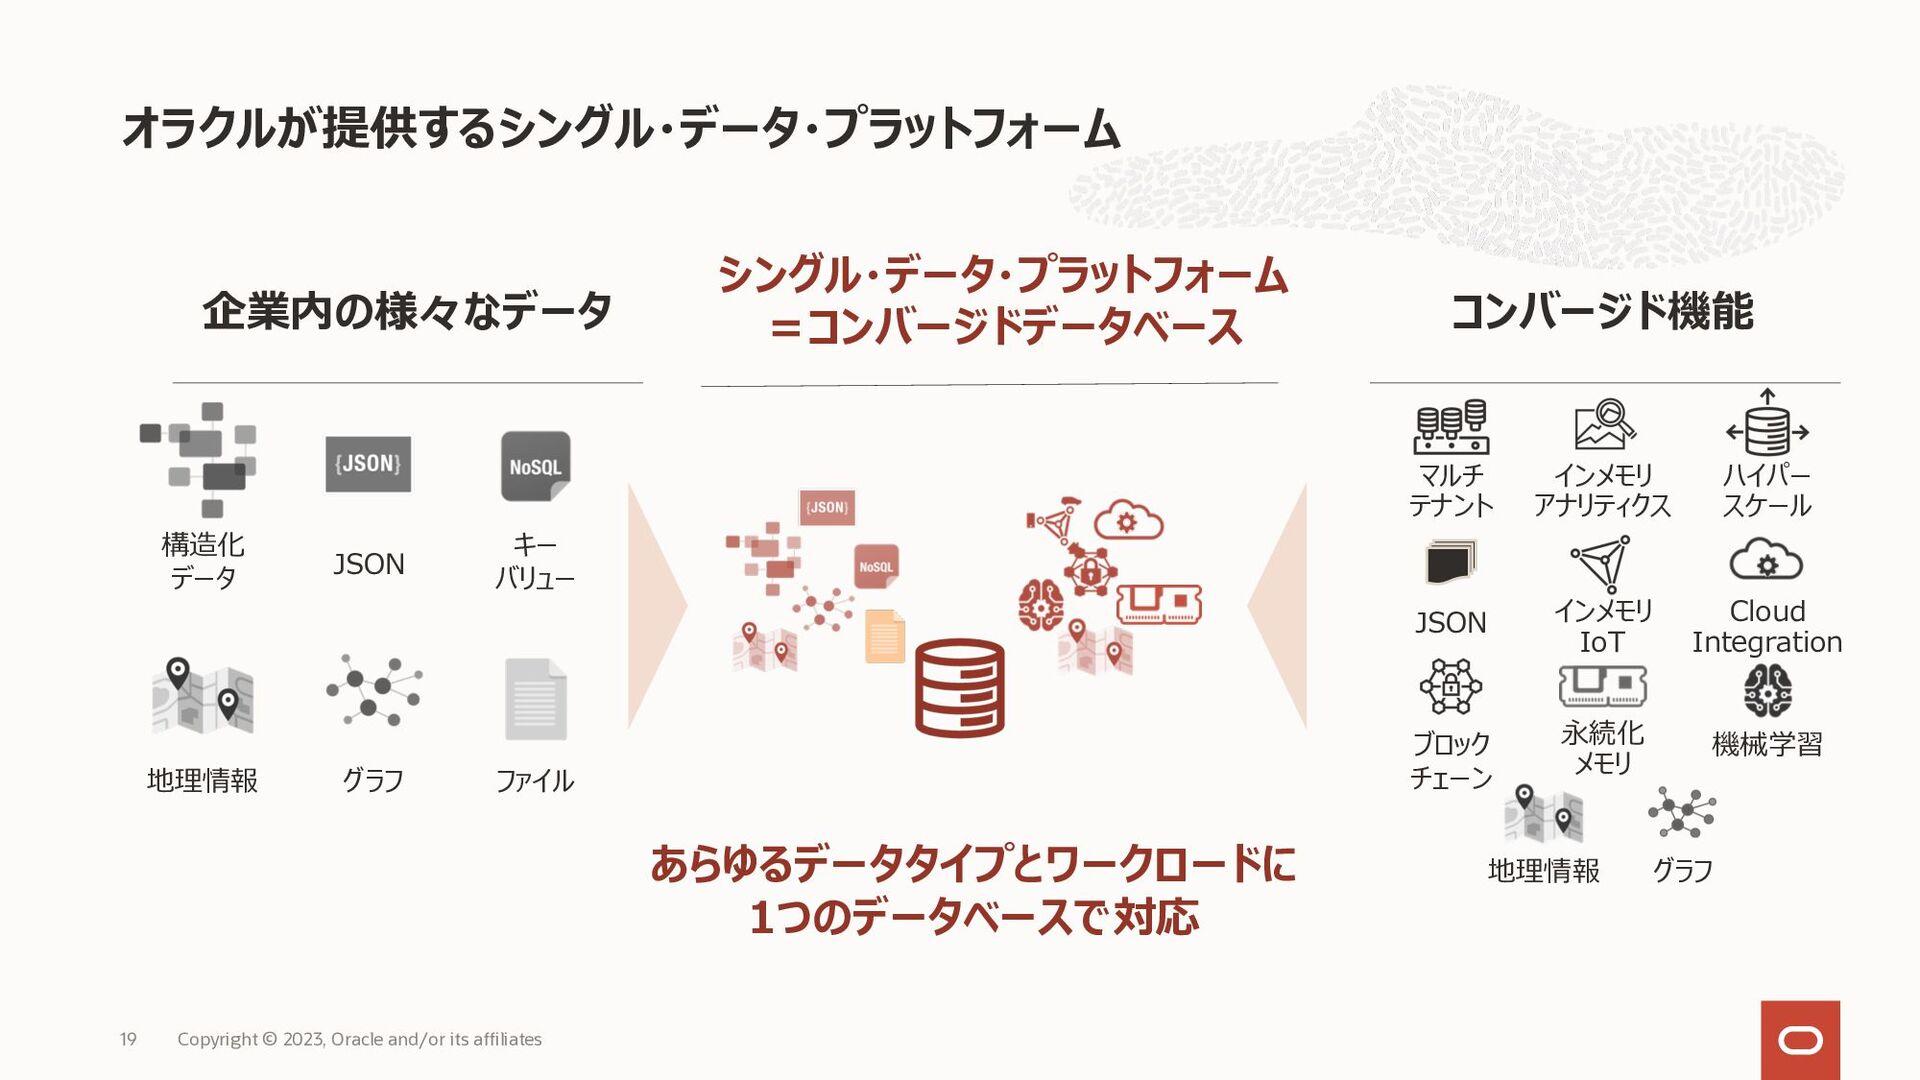 Autonomous Database ビジネスへの貢献度の高いタスクへ人的リソースをシフト可...